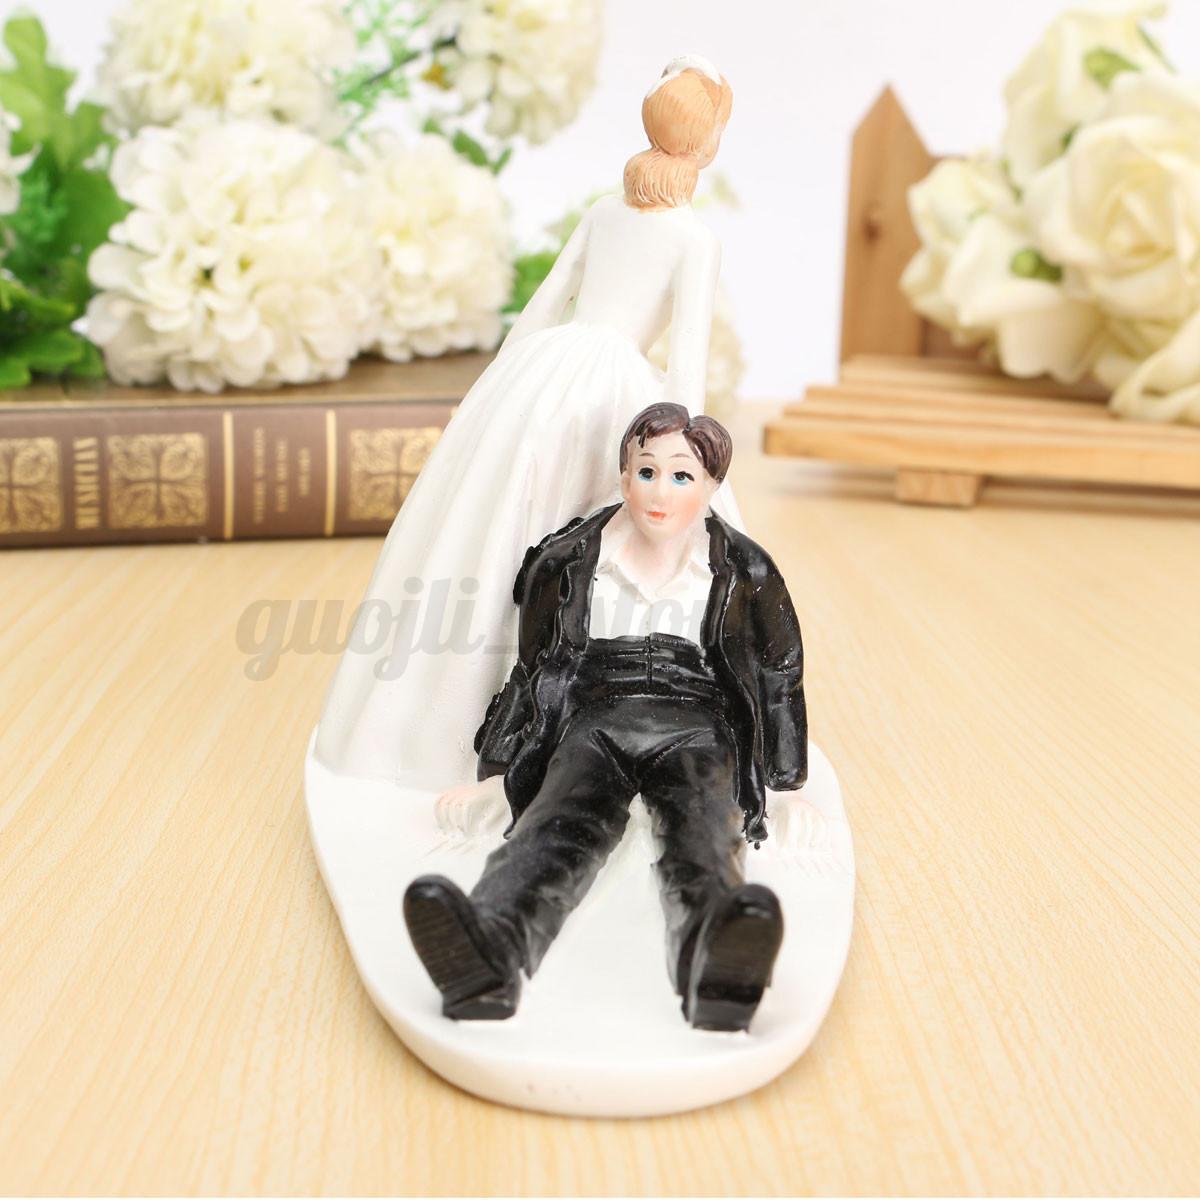 Romantic Couple Wedding Cake Topper Love Favors Figurine